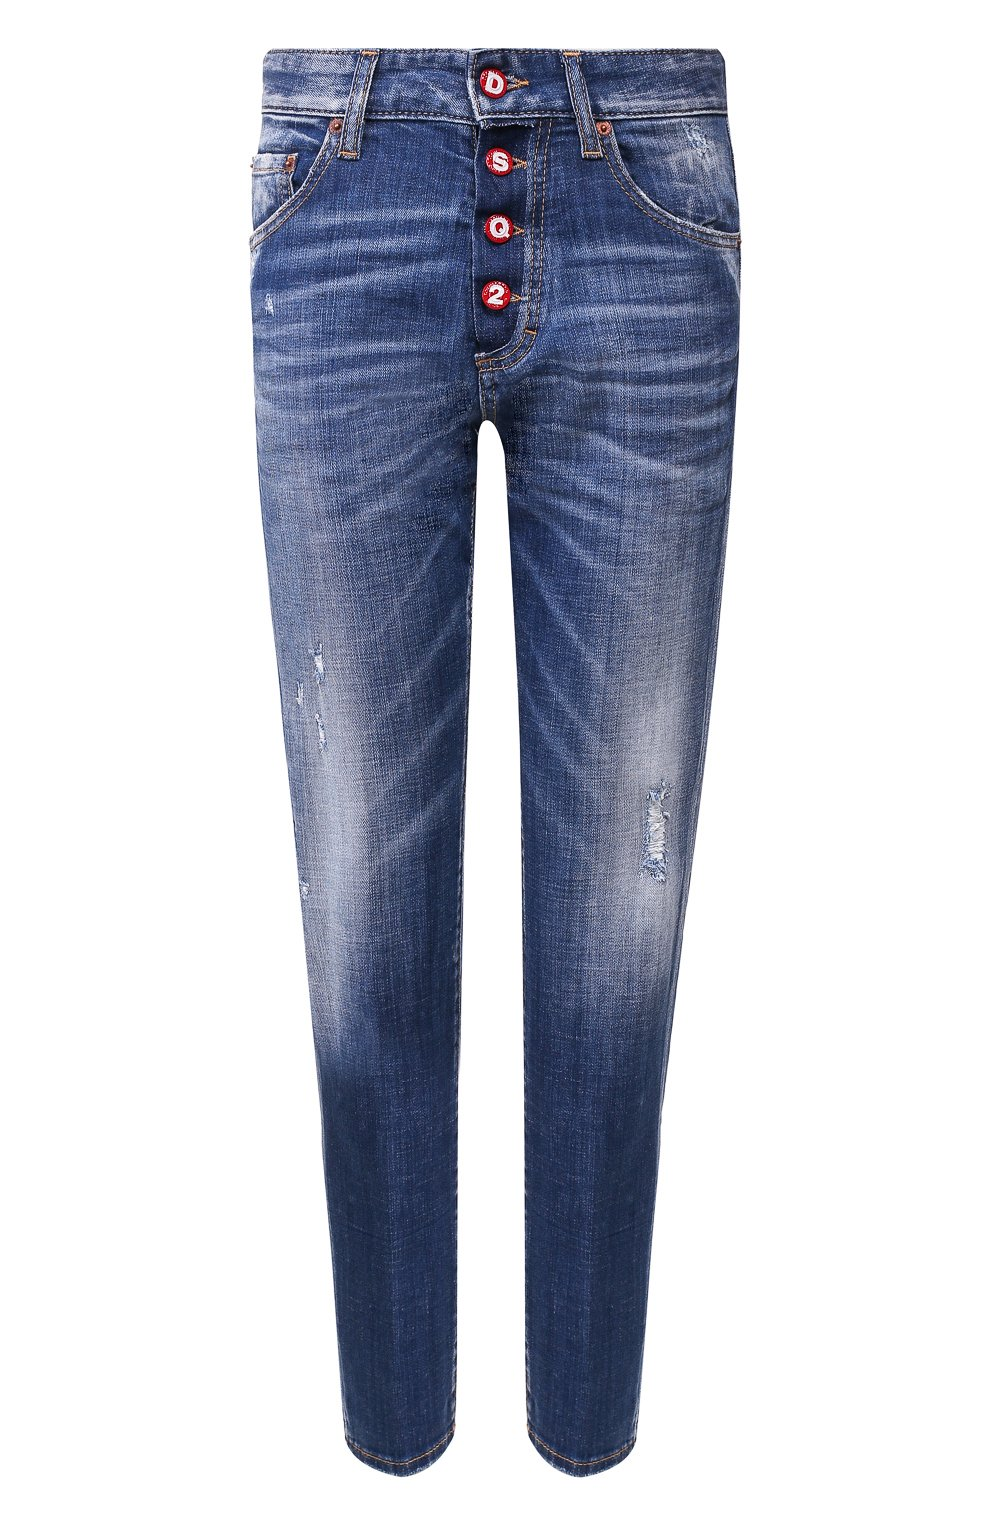 Женские джинсы DSQUARED2 синего цвета, арт. S72LB0287/S30342 | Фото 1